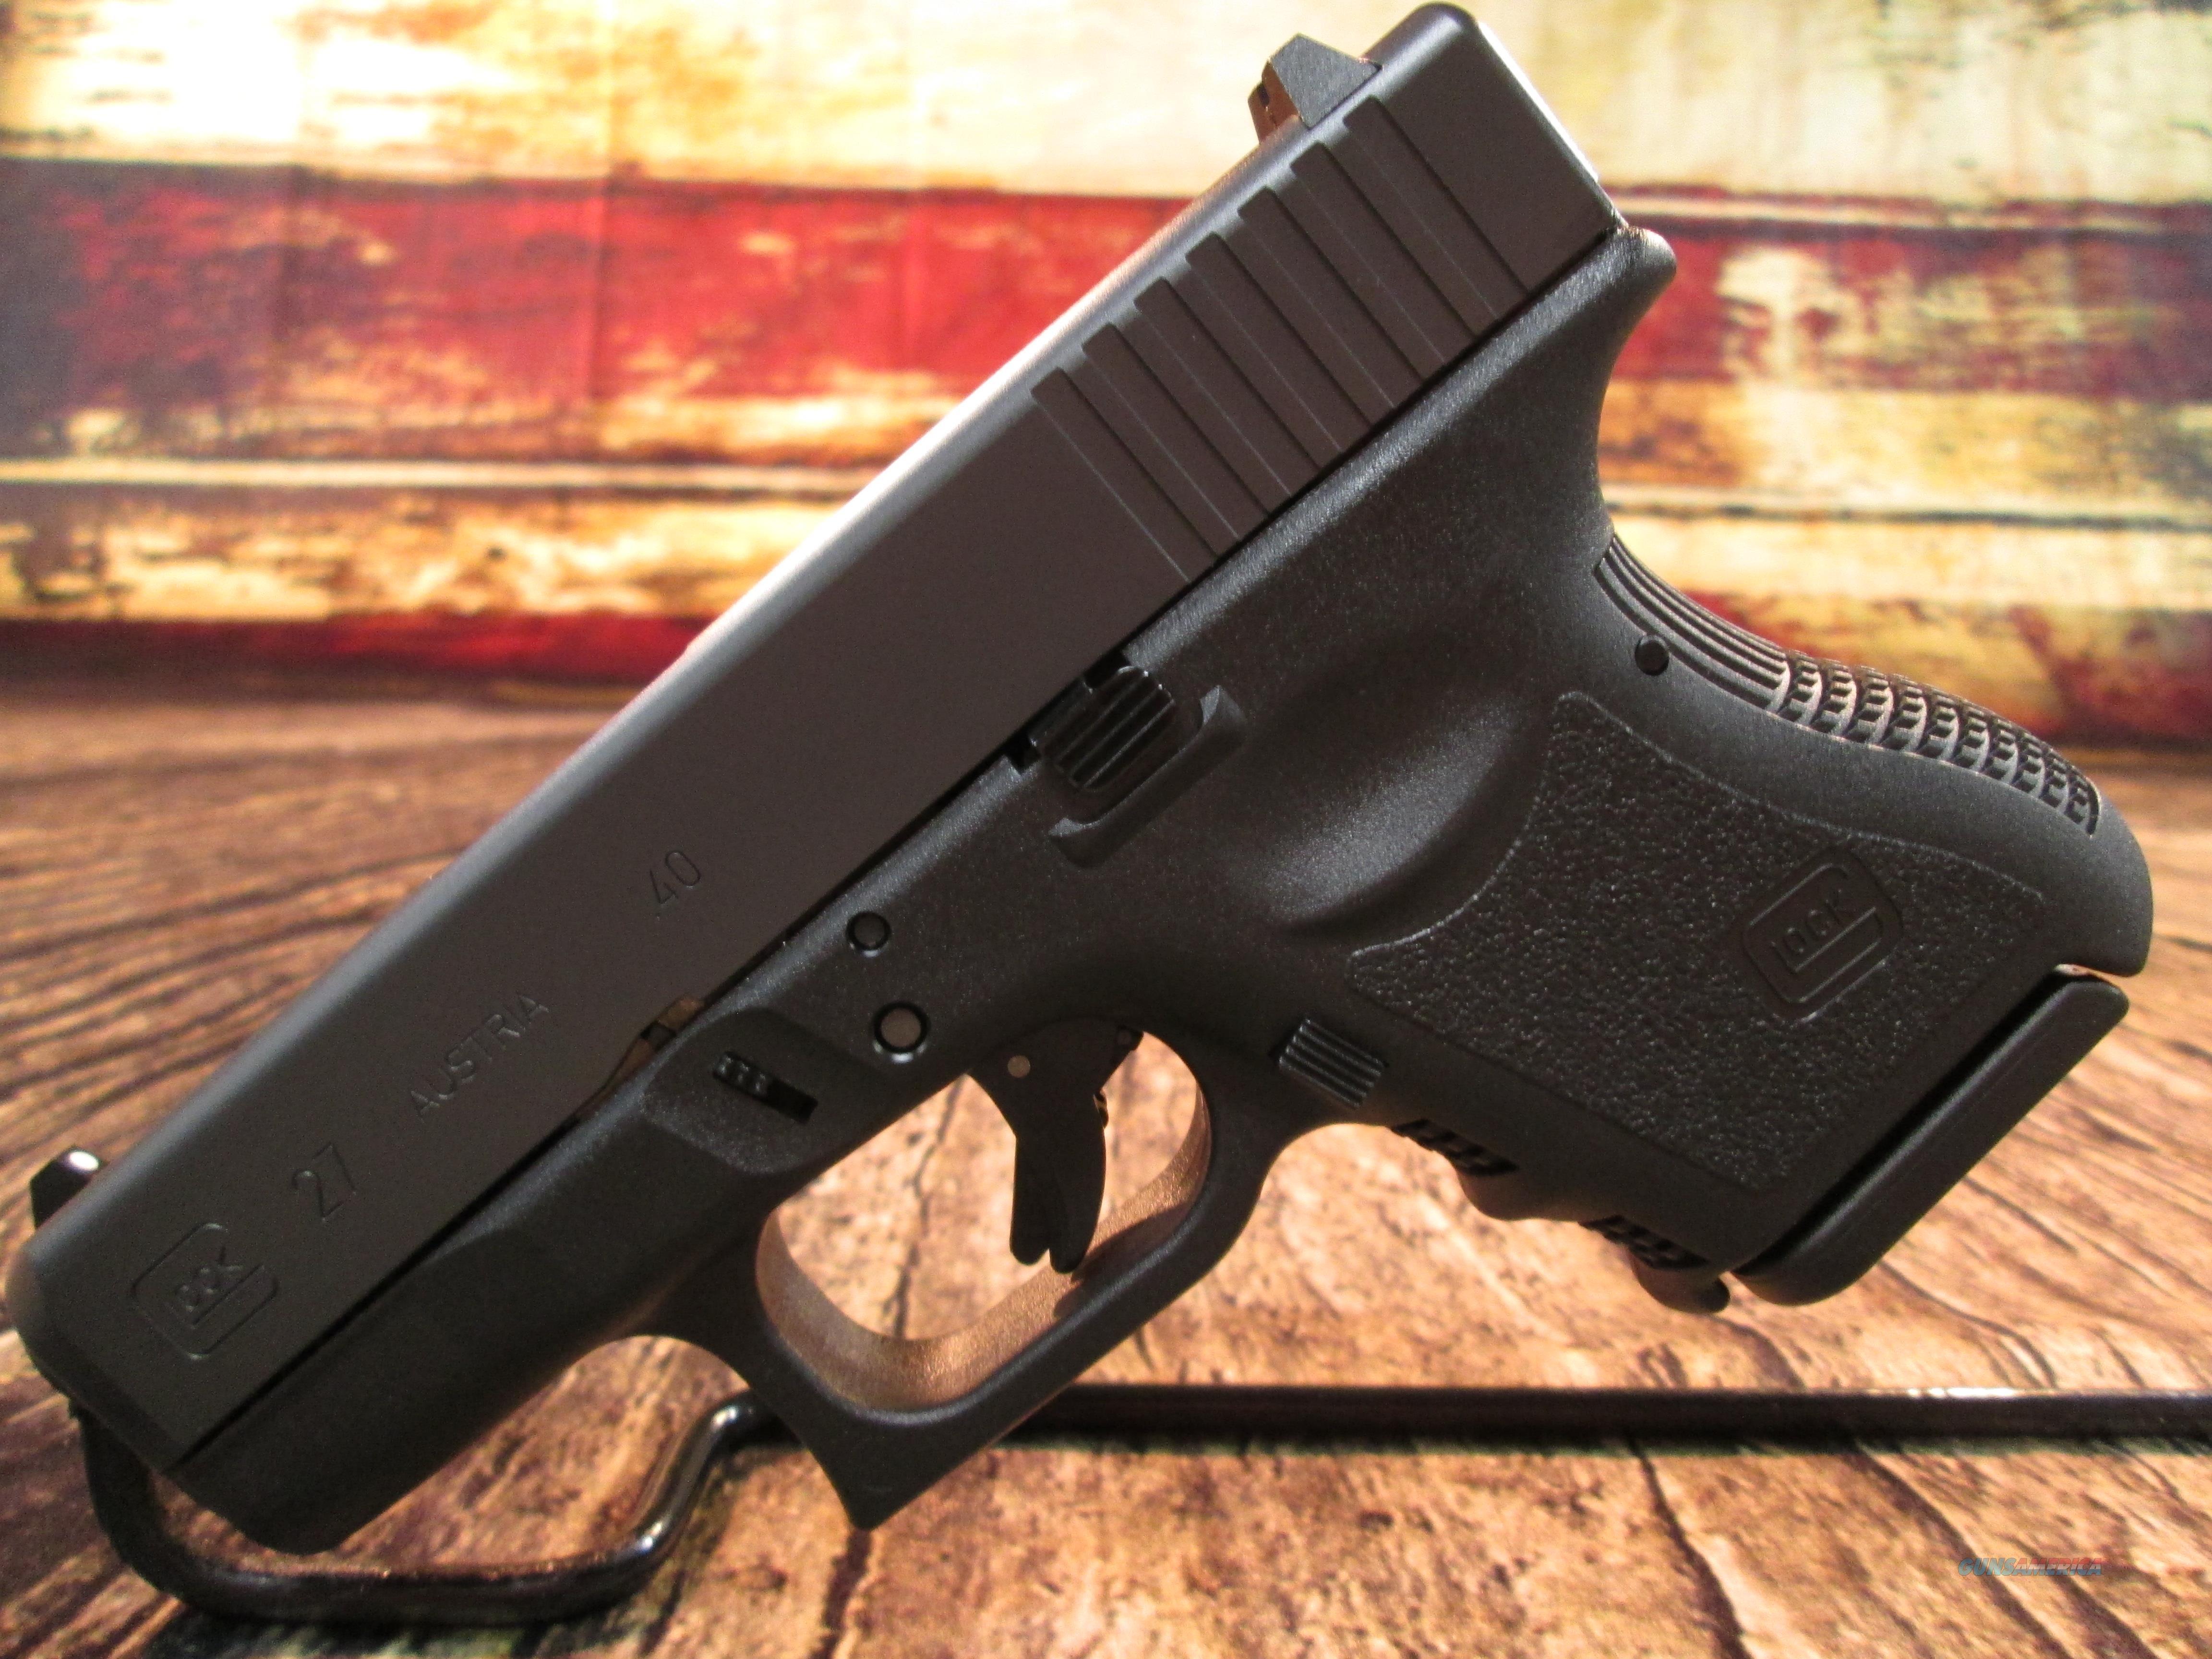 GLOCK MODEL 27 GEN 3 40 S&W NEW (PI2750201)  Guns > Pistols > Glock Pistols > 26/27